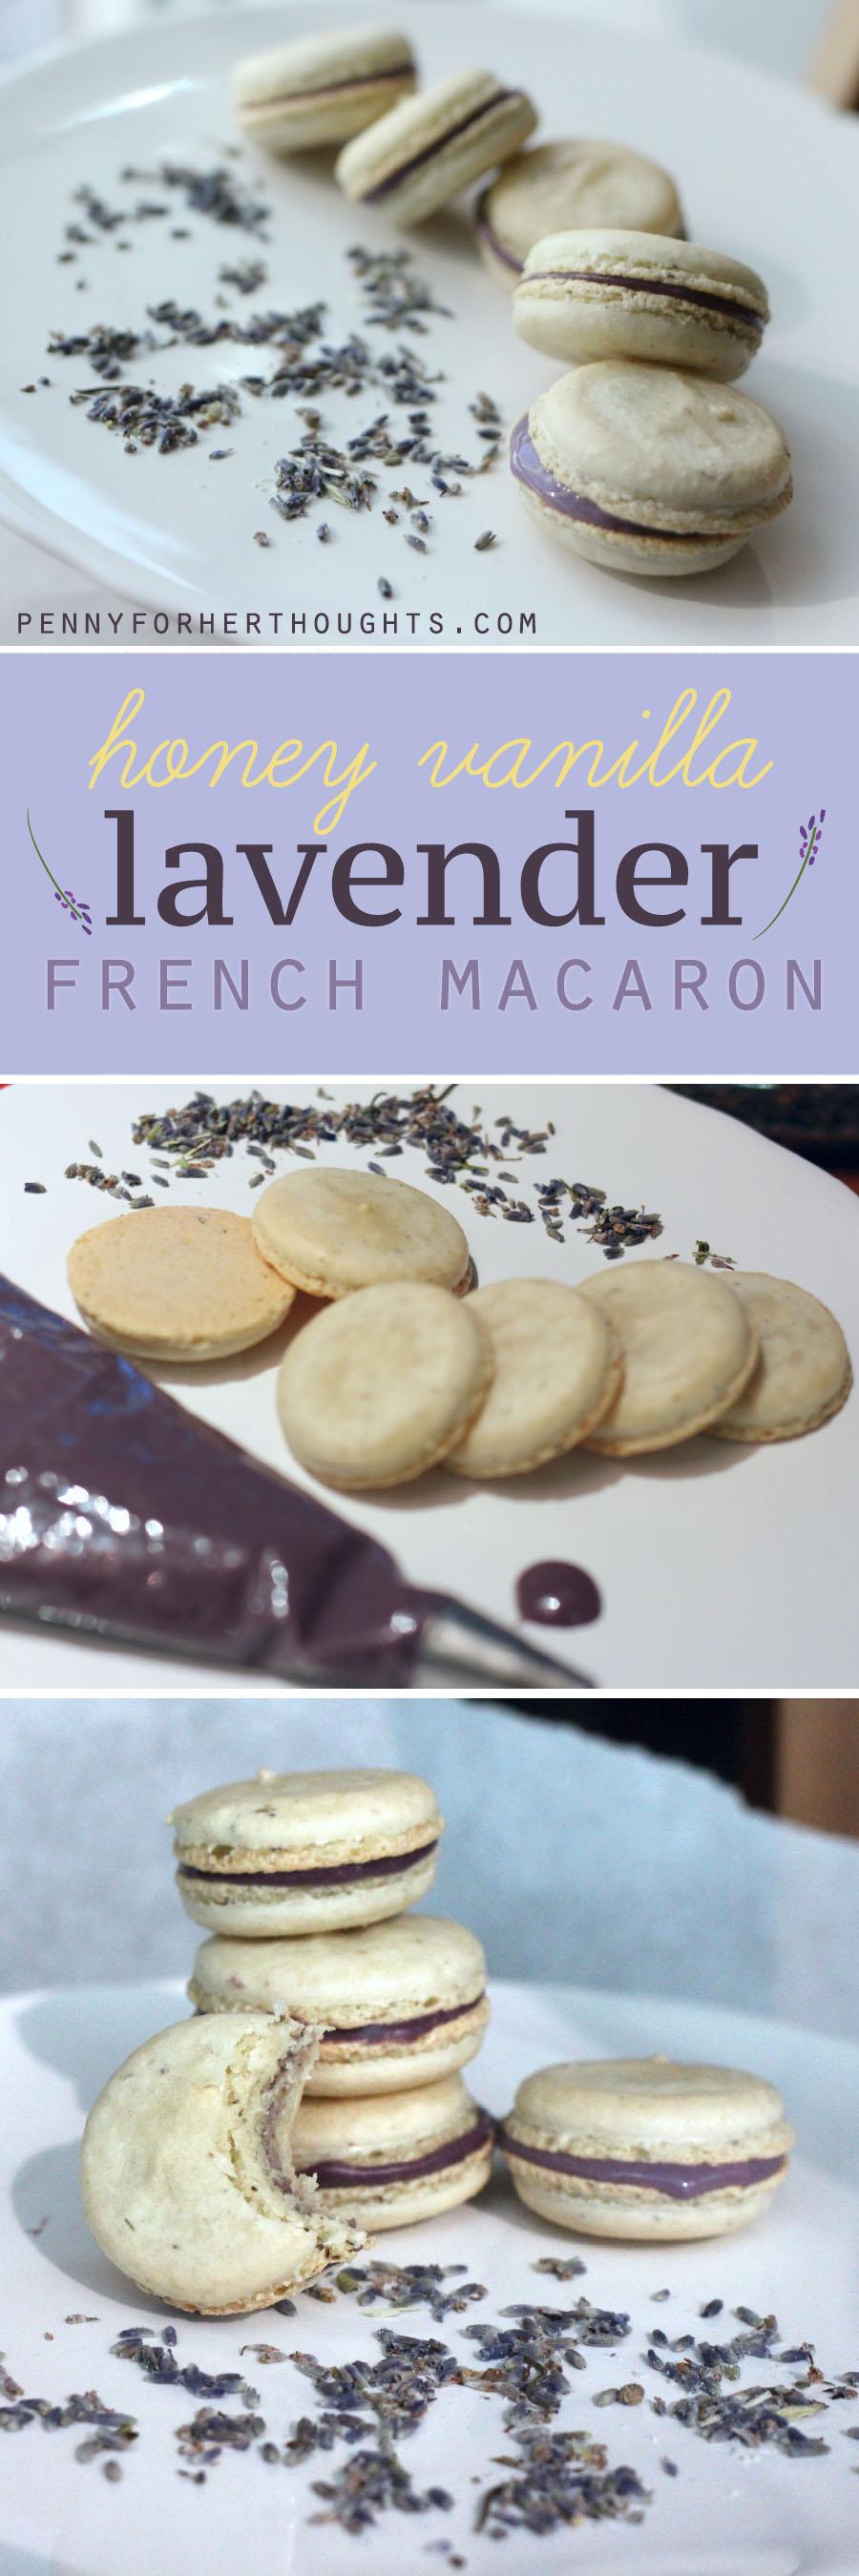 Lavender Macaron with Honey Vanilla Filling